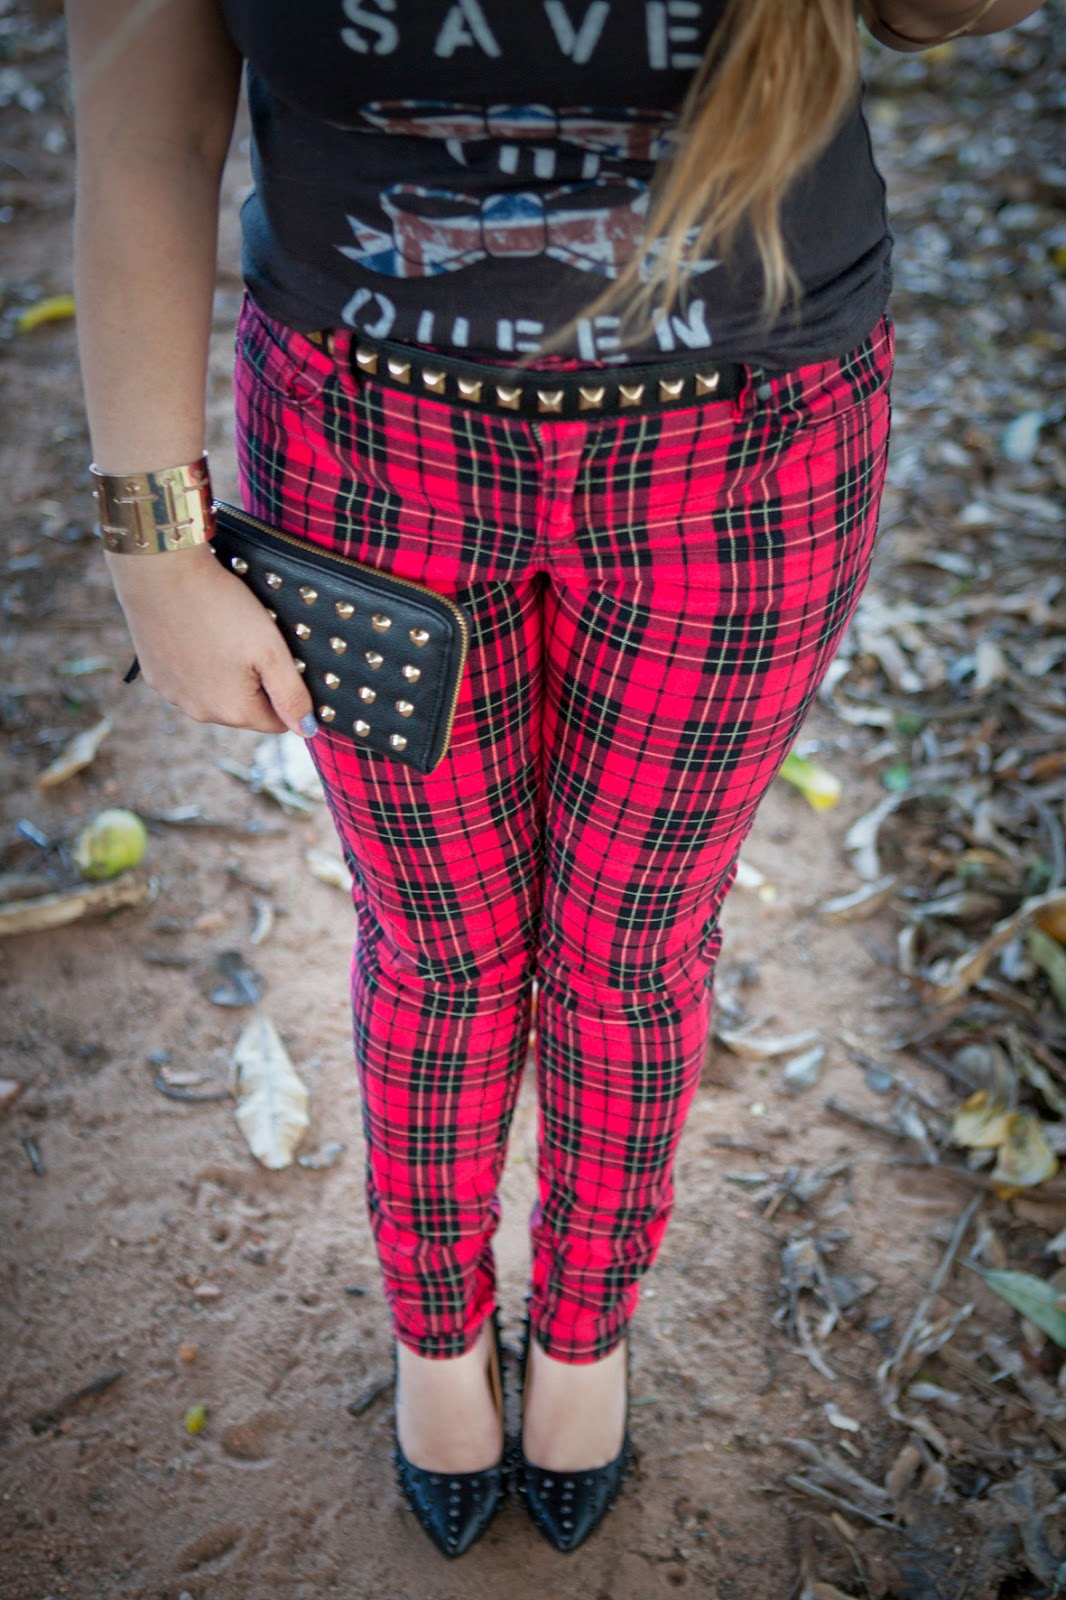 acho tendência, blog de moda, look do dia, look rocker, calça xadrez, tartan, spikes, tachinhas, punk, god save the queen, inglaterra, mogi mirim, mogi guaçu, campinas